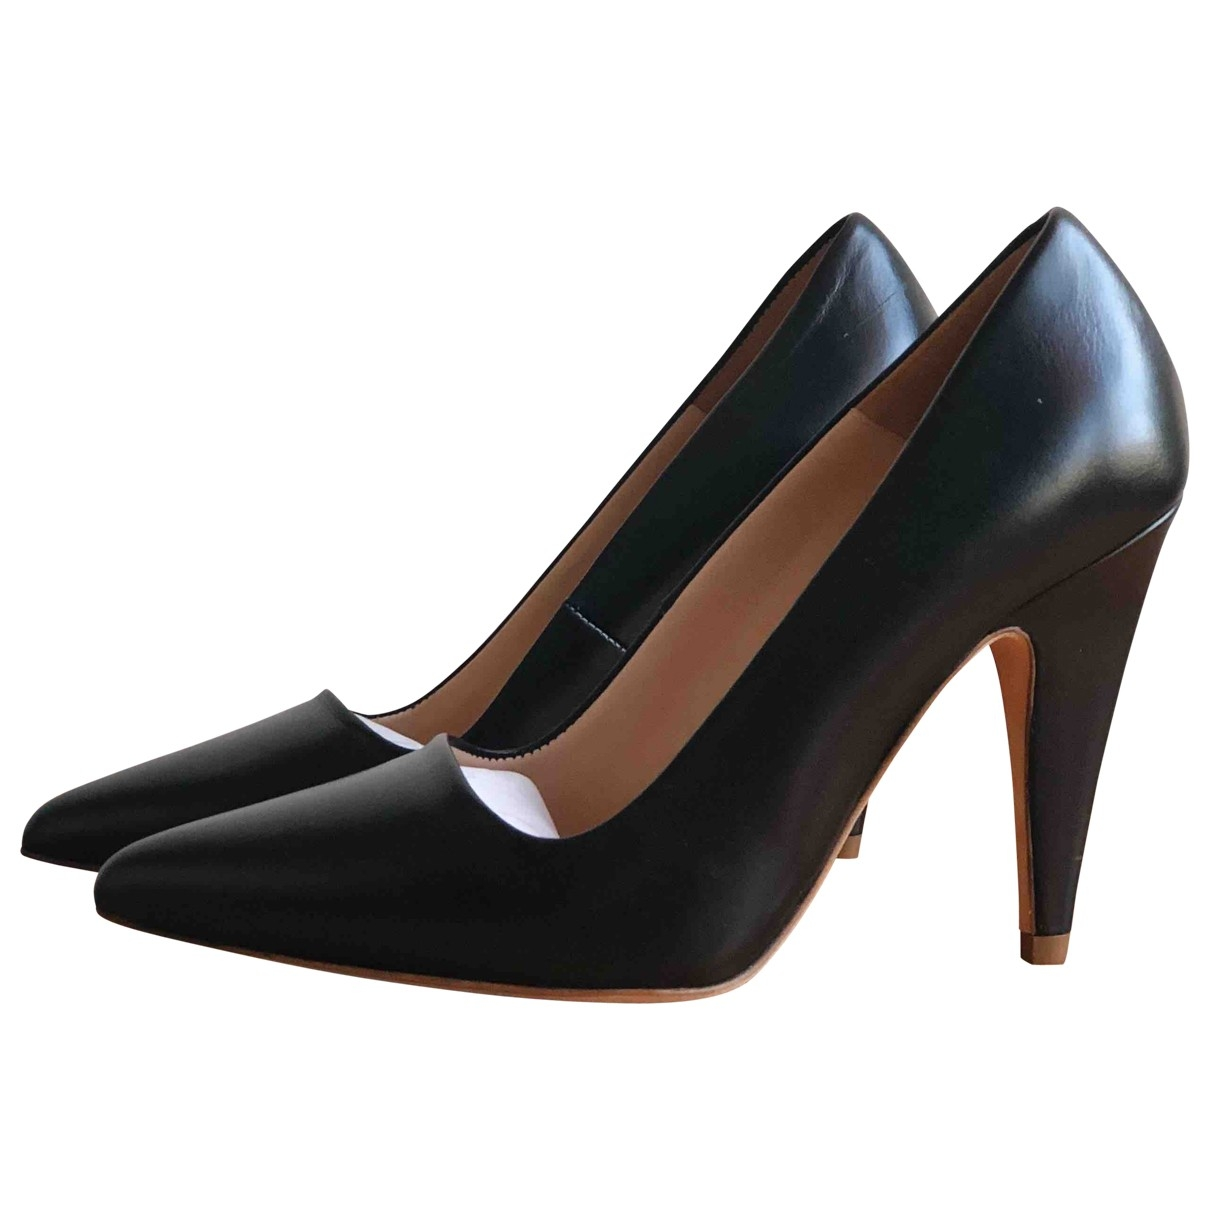 Bimba Y Lola - Escarpins   pour femme en cuir - noir